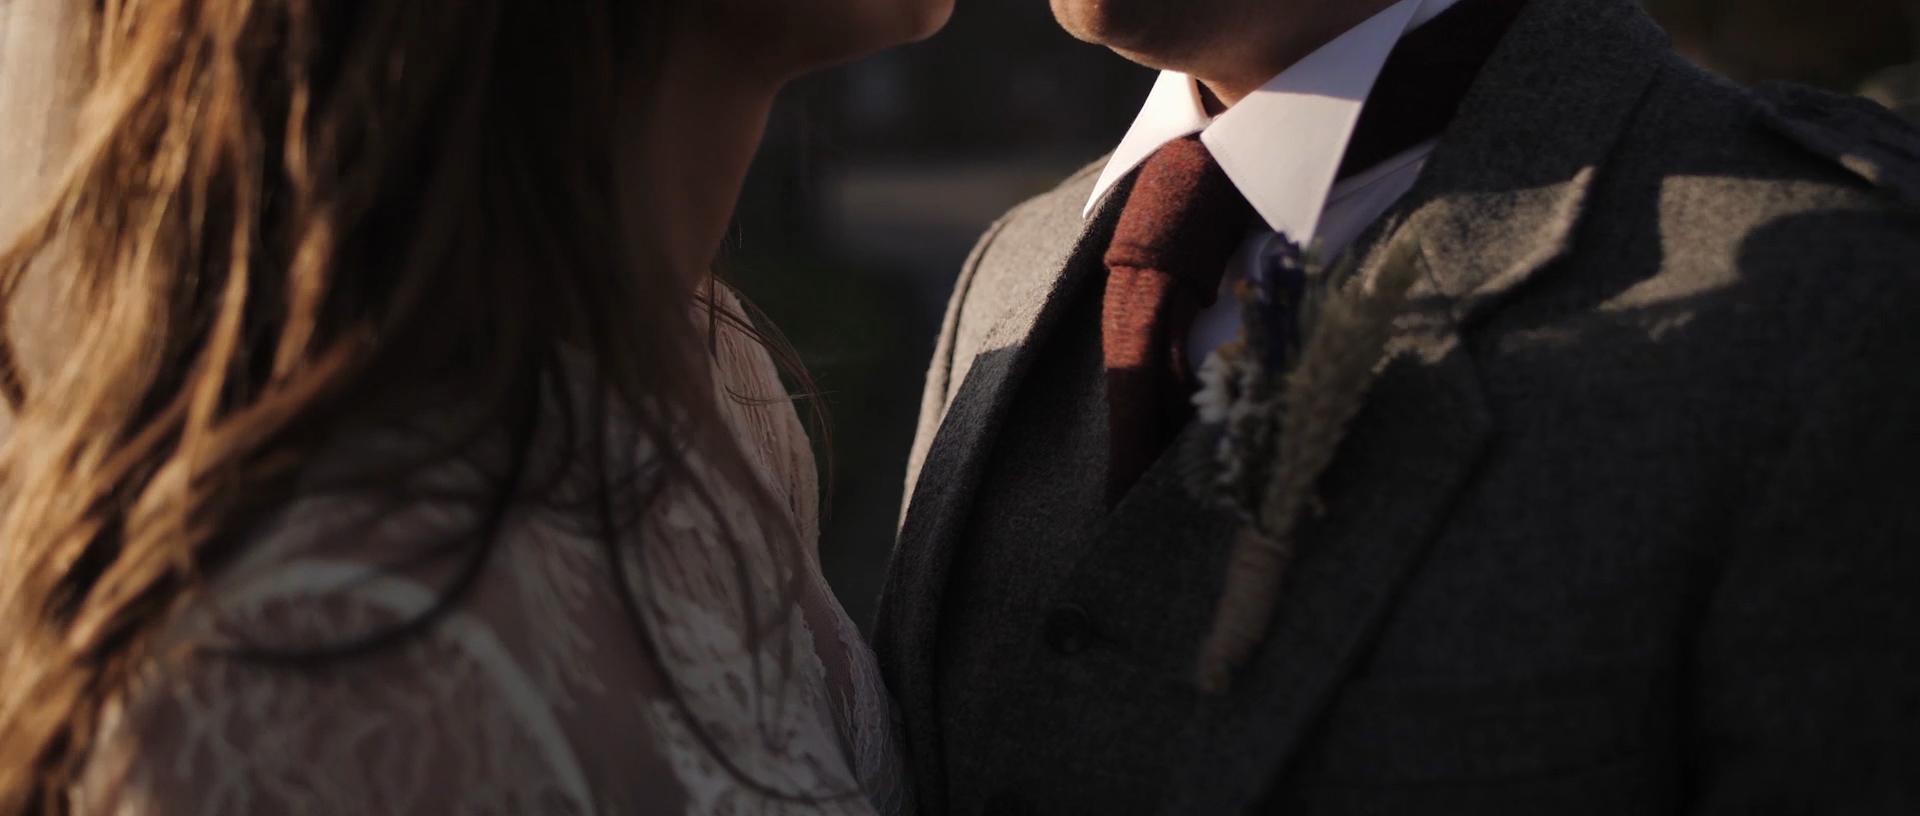 cardross-estate-wedding-videographer_LL_04.jpg